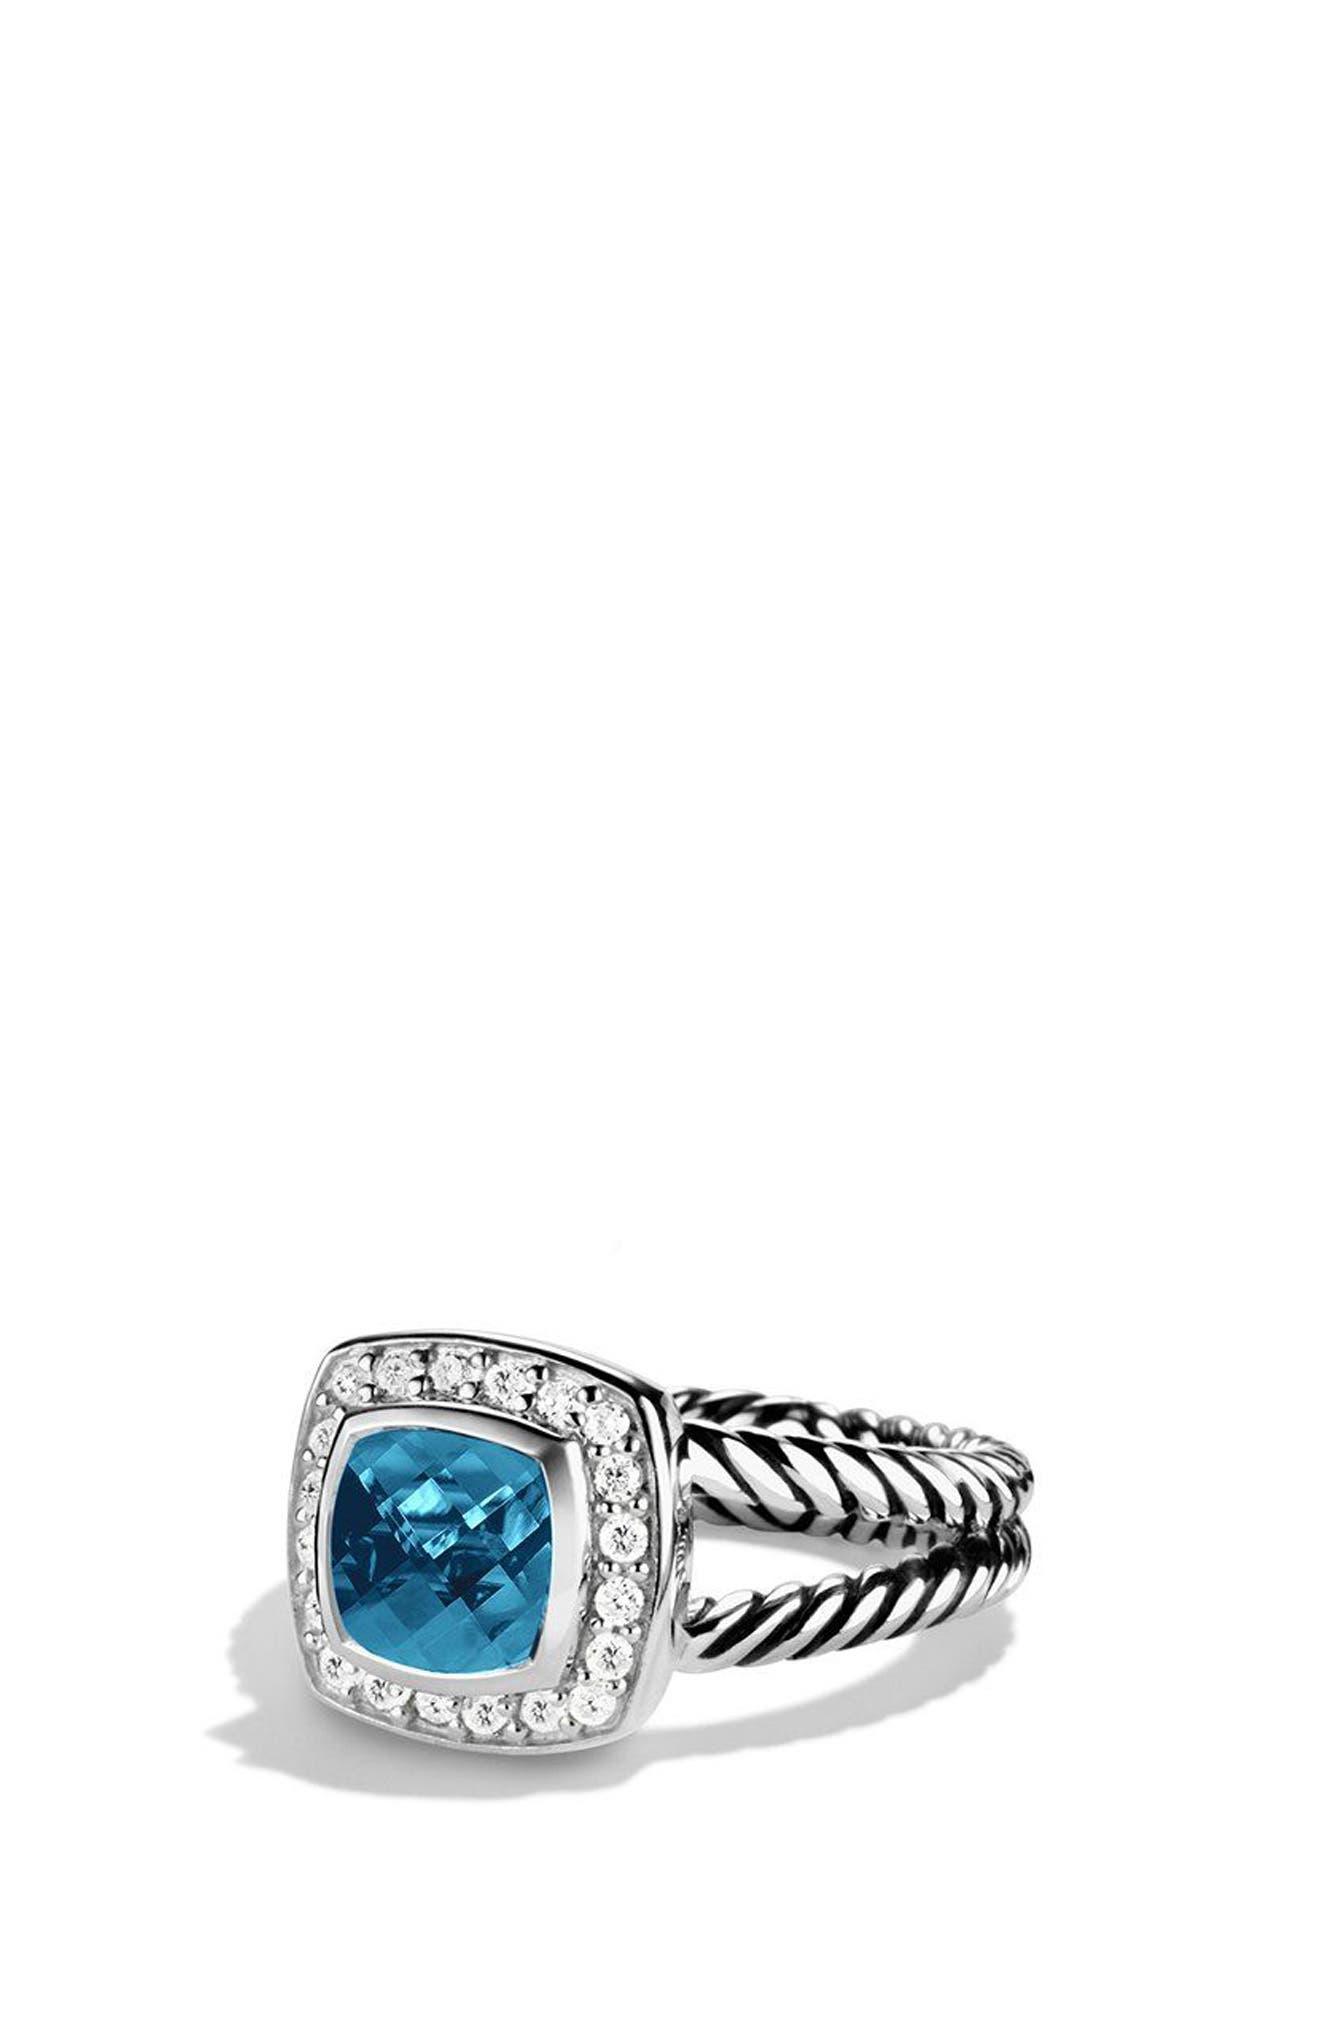 David Yurman Split Shank Ring With Hampton Blue Topaz And Diamonds